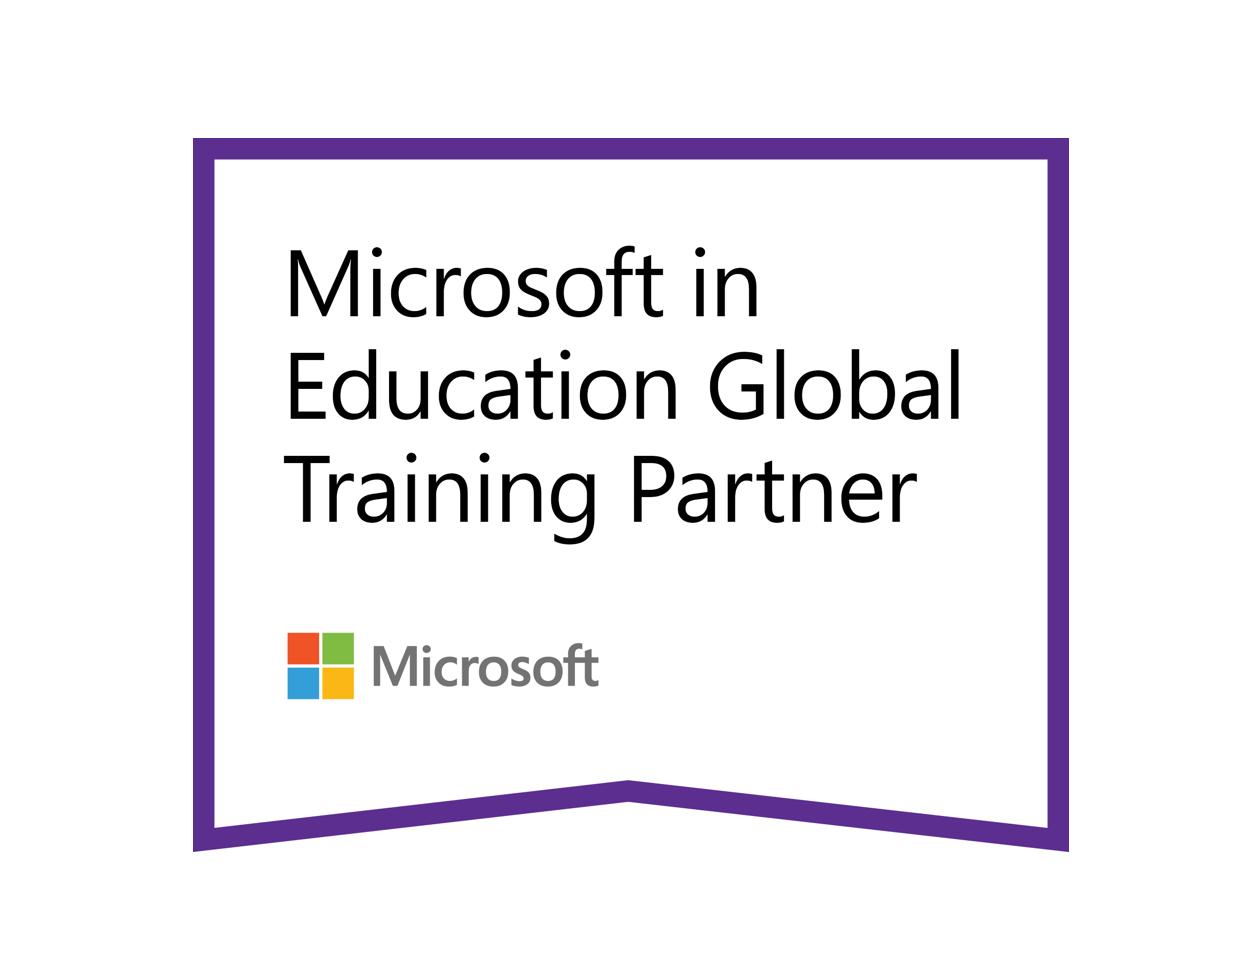 Microsoft in Education global training partner